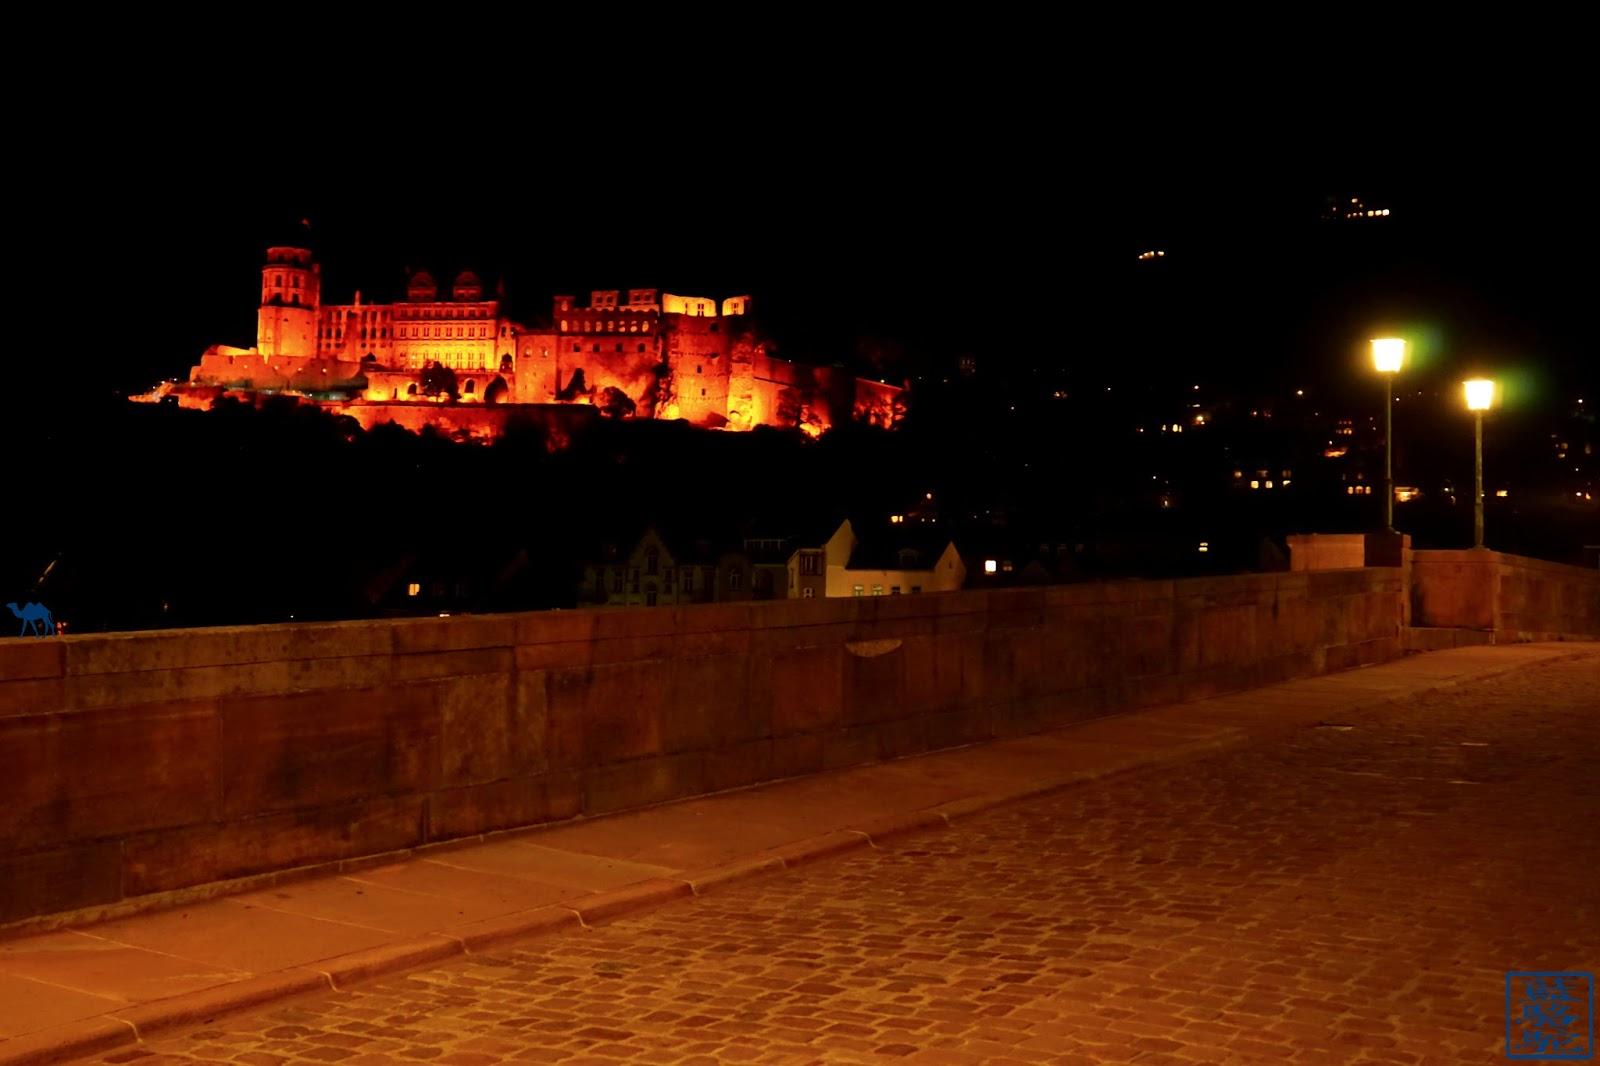 Le Chameau Bleu - Chateau d`Heidelberg by night